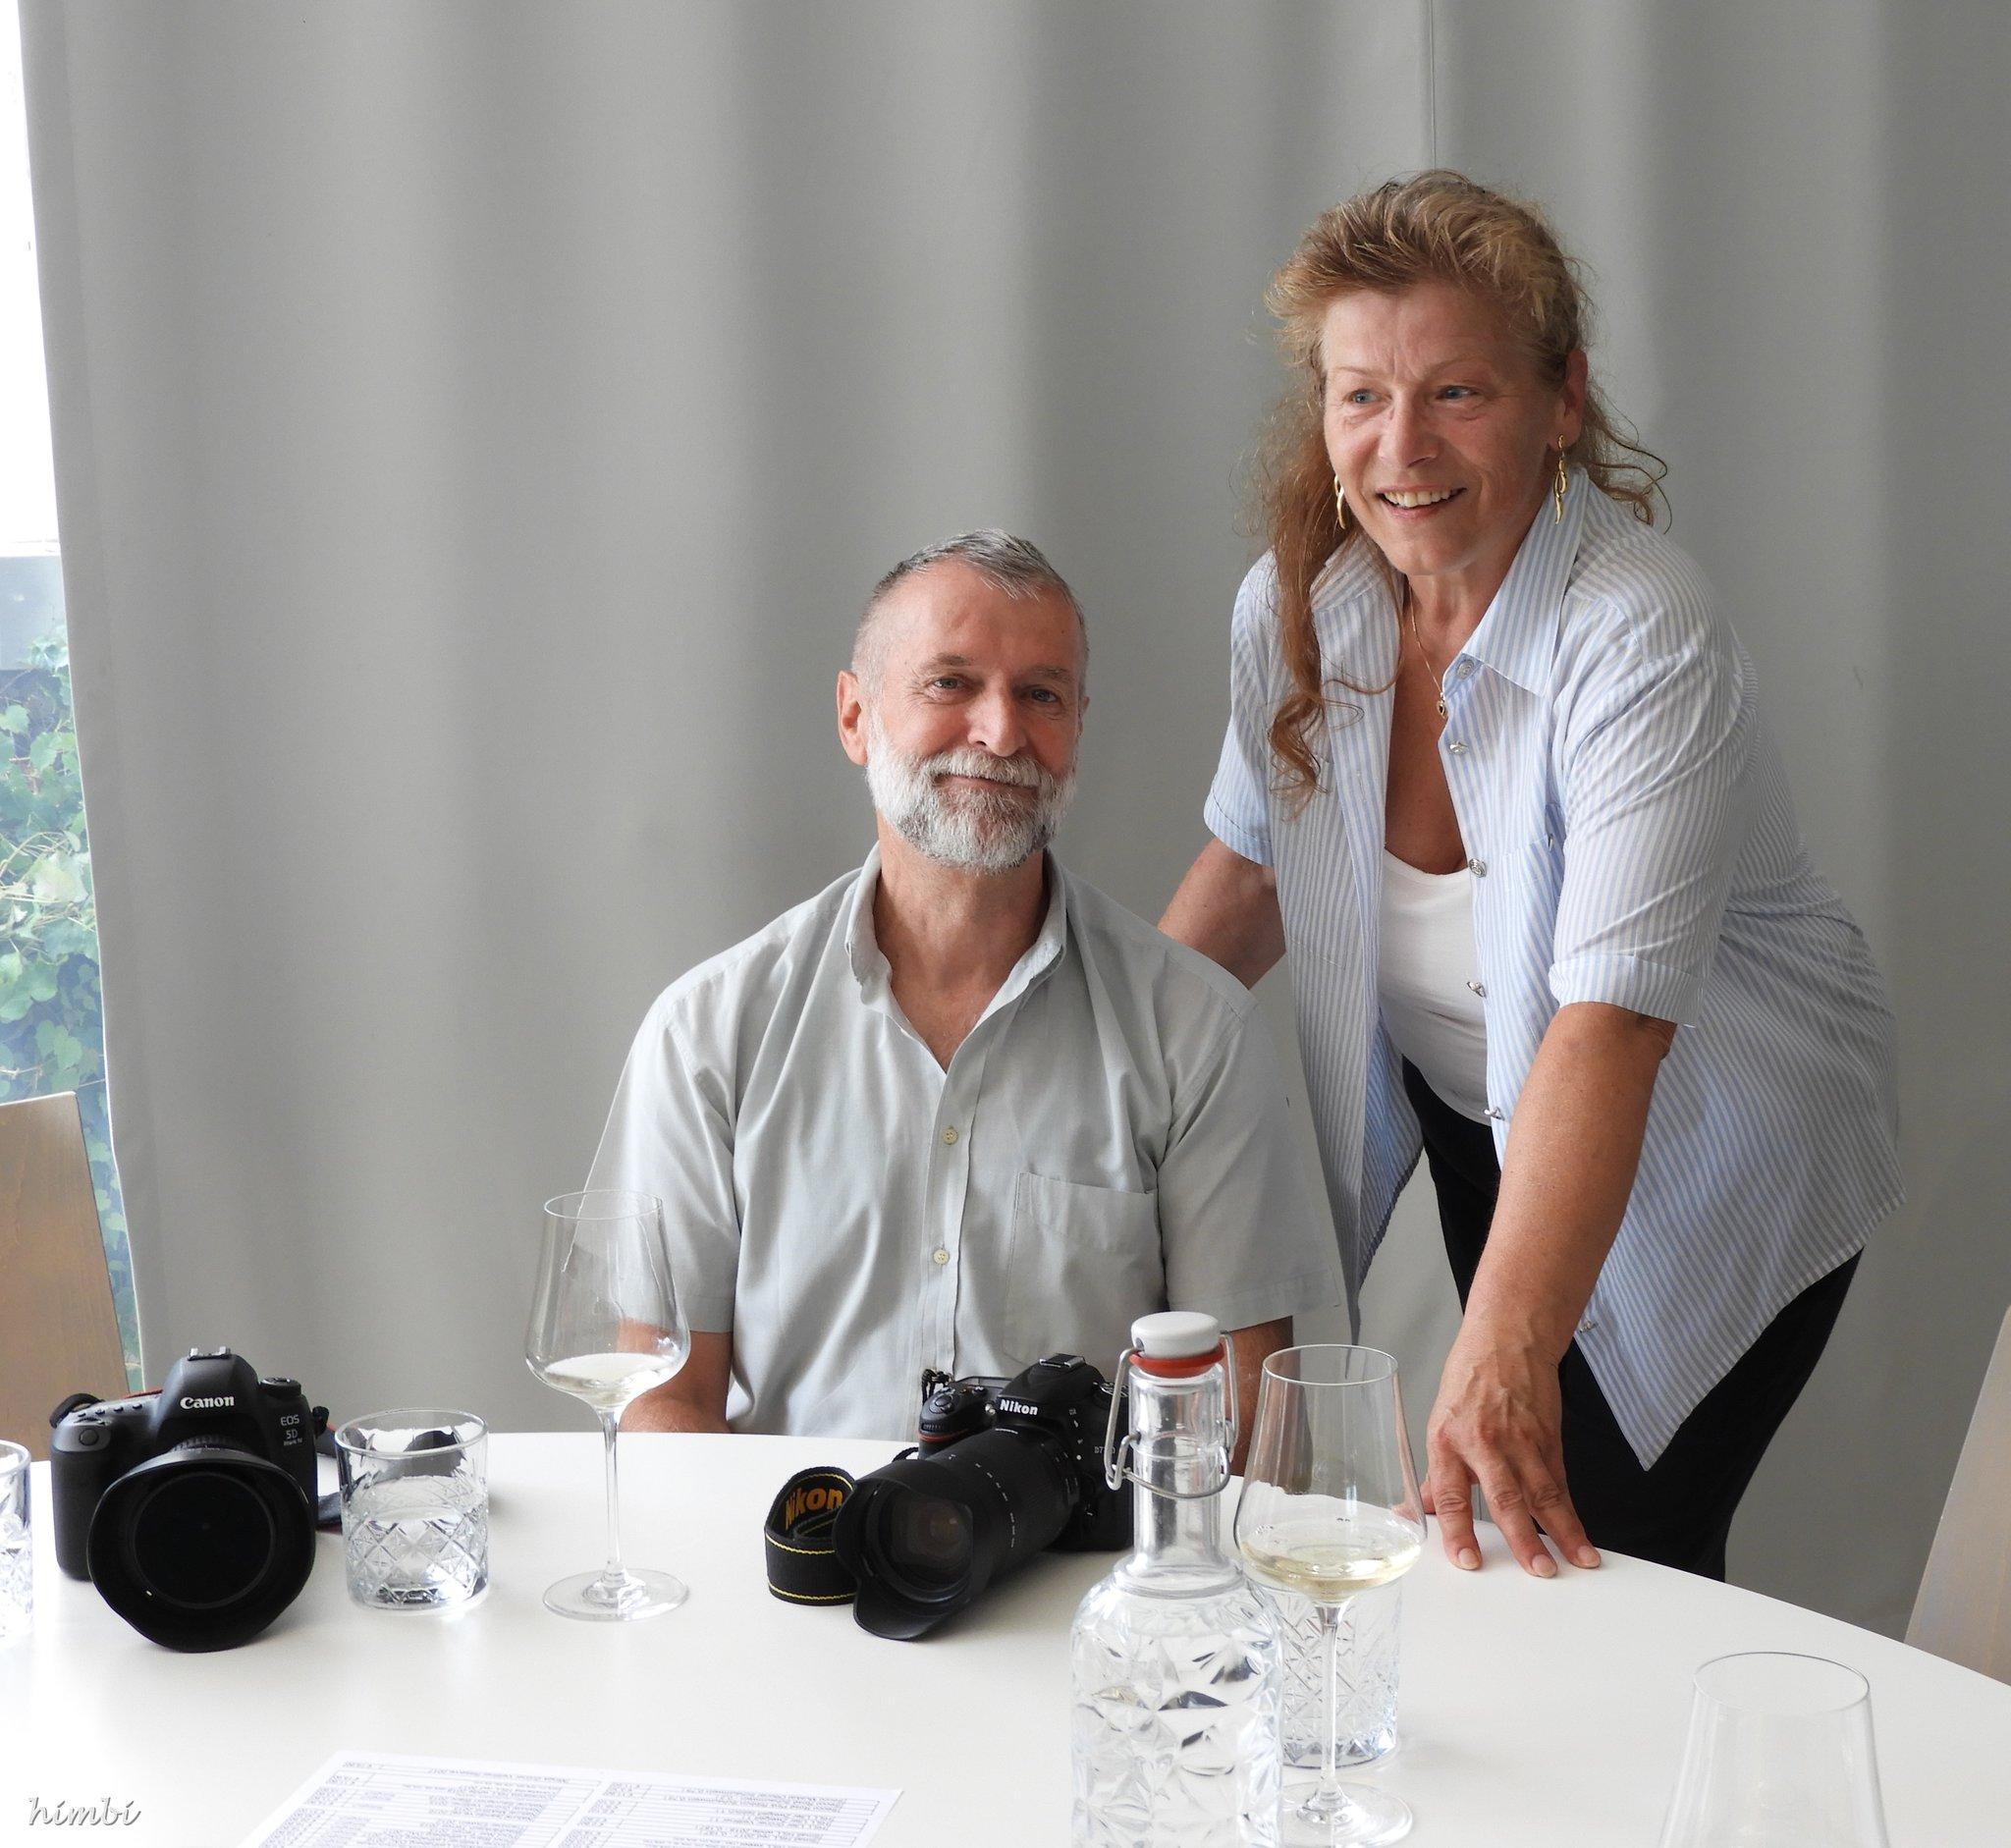 Dr. Leitner Ursula in 2486 Pottendorf | Hausarzt auf huggology.com